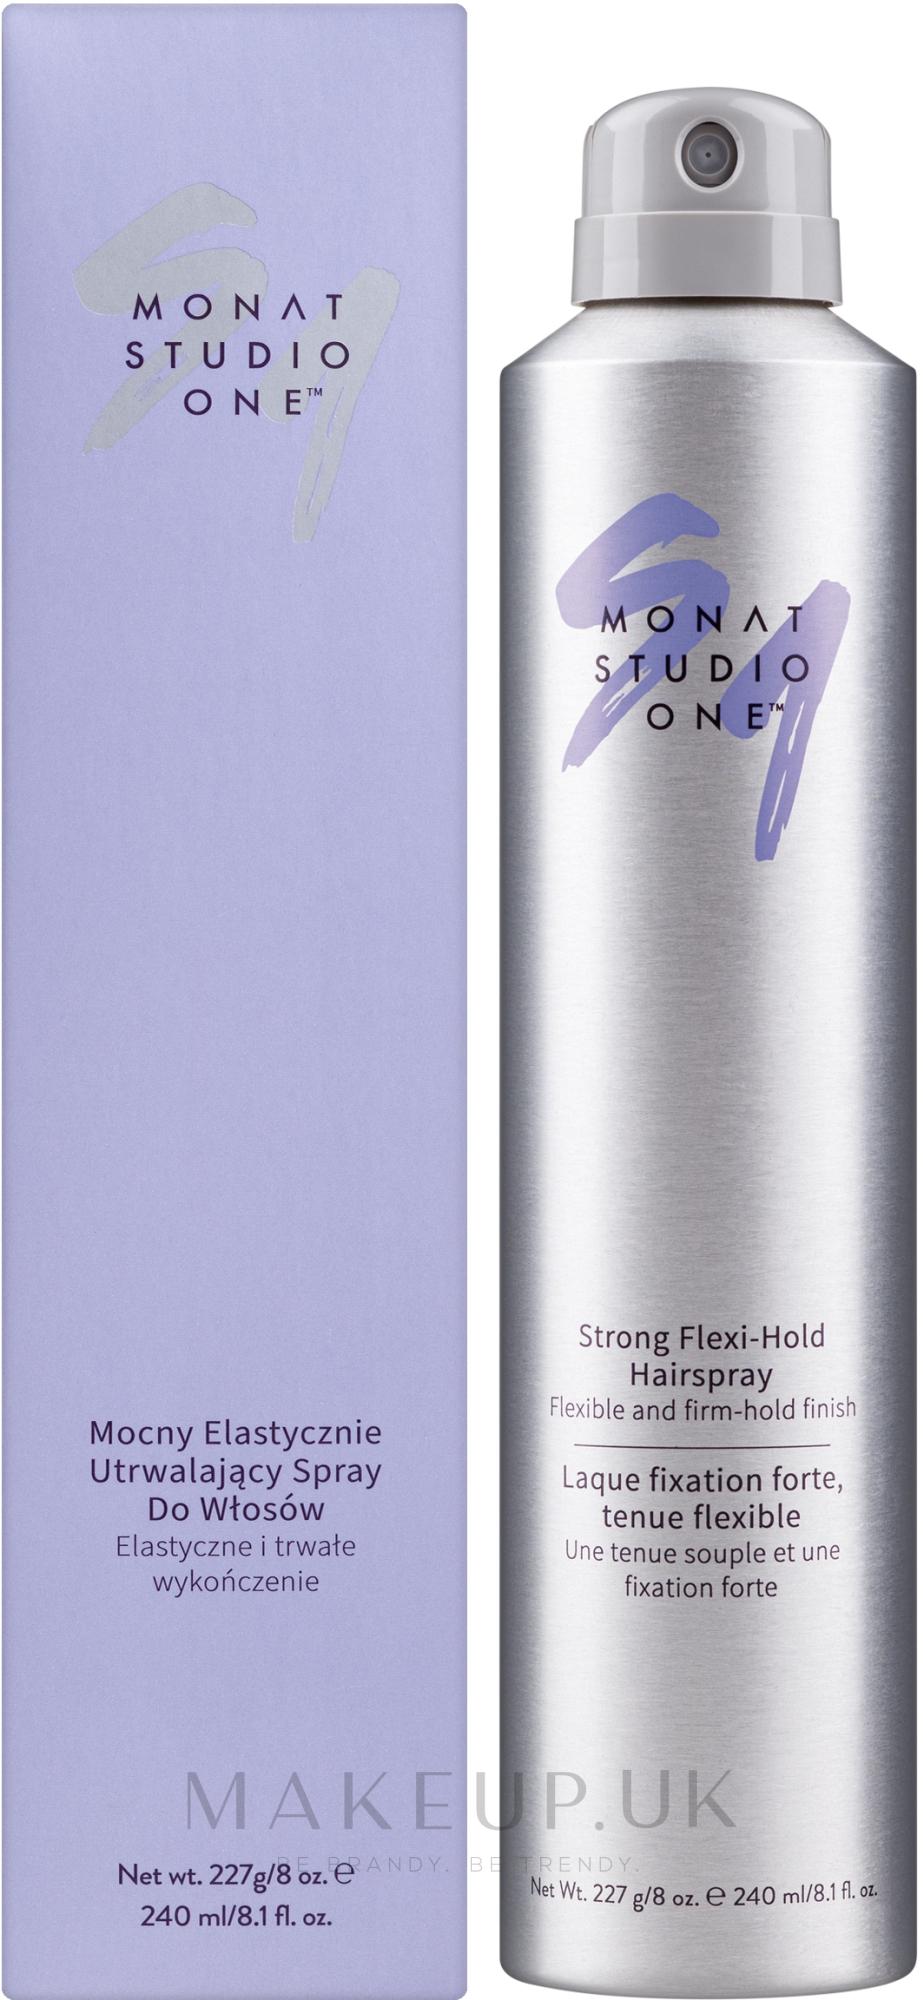 Strong Flexi-Hold Hairspray - Monat Studio One Strong Flexi-Hold Hairspray — photo 240 ml